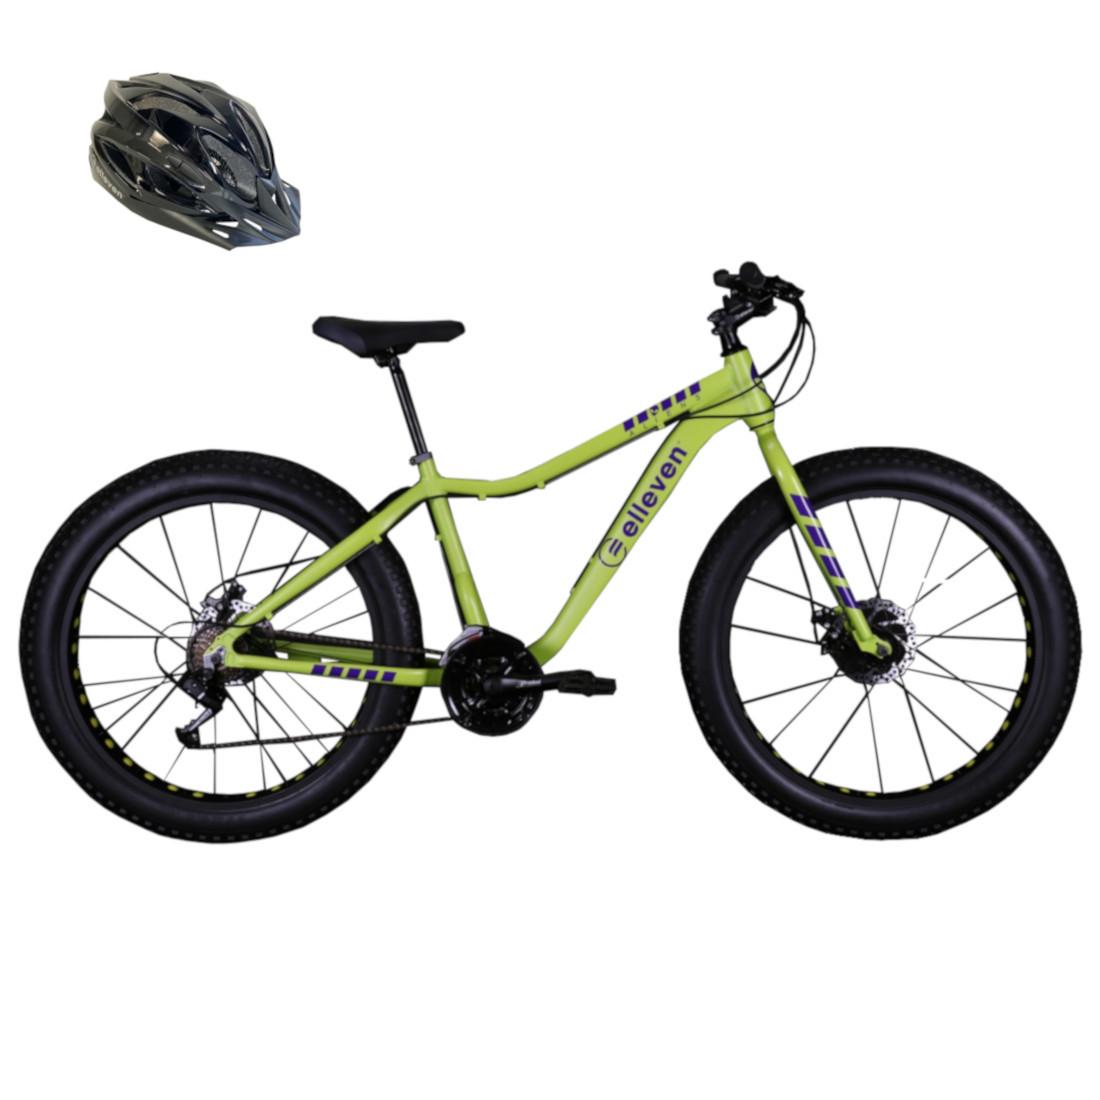 Bicicleta Fat Bike Pneu Largo Aro 26 21V Verde Oliva com Capacete G